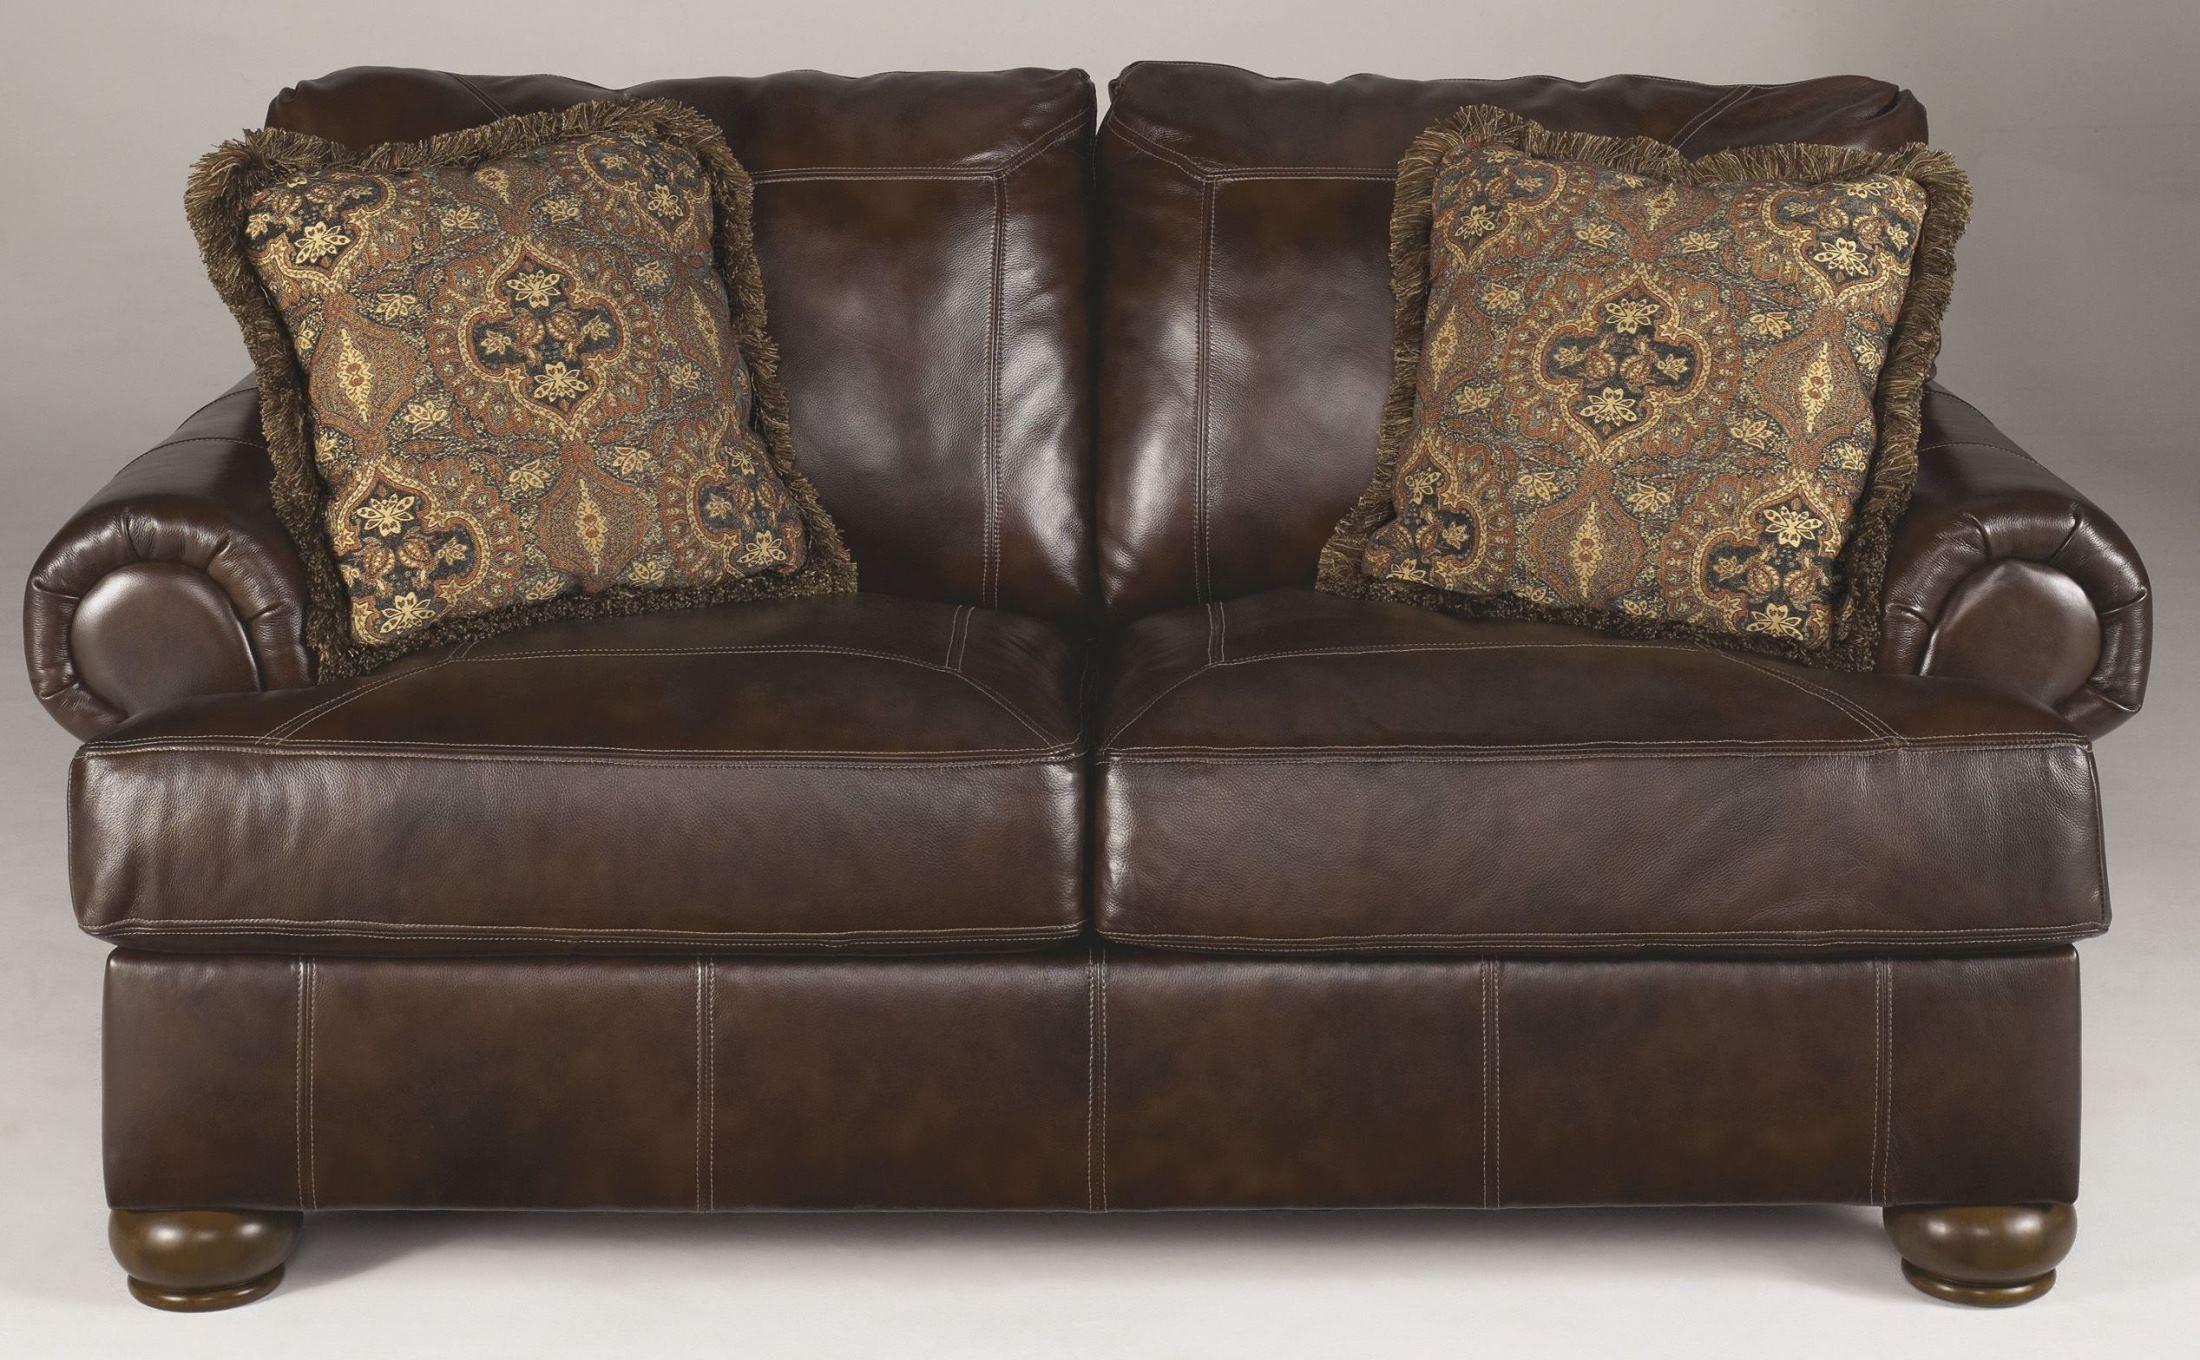 Axiom Walnut Living Room Set from Ashley